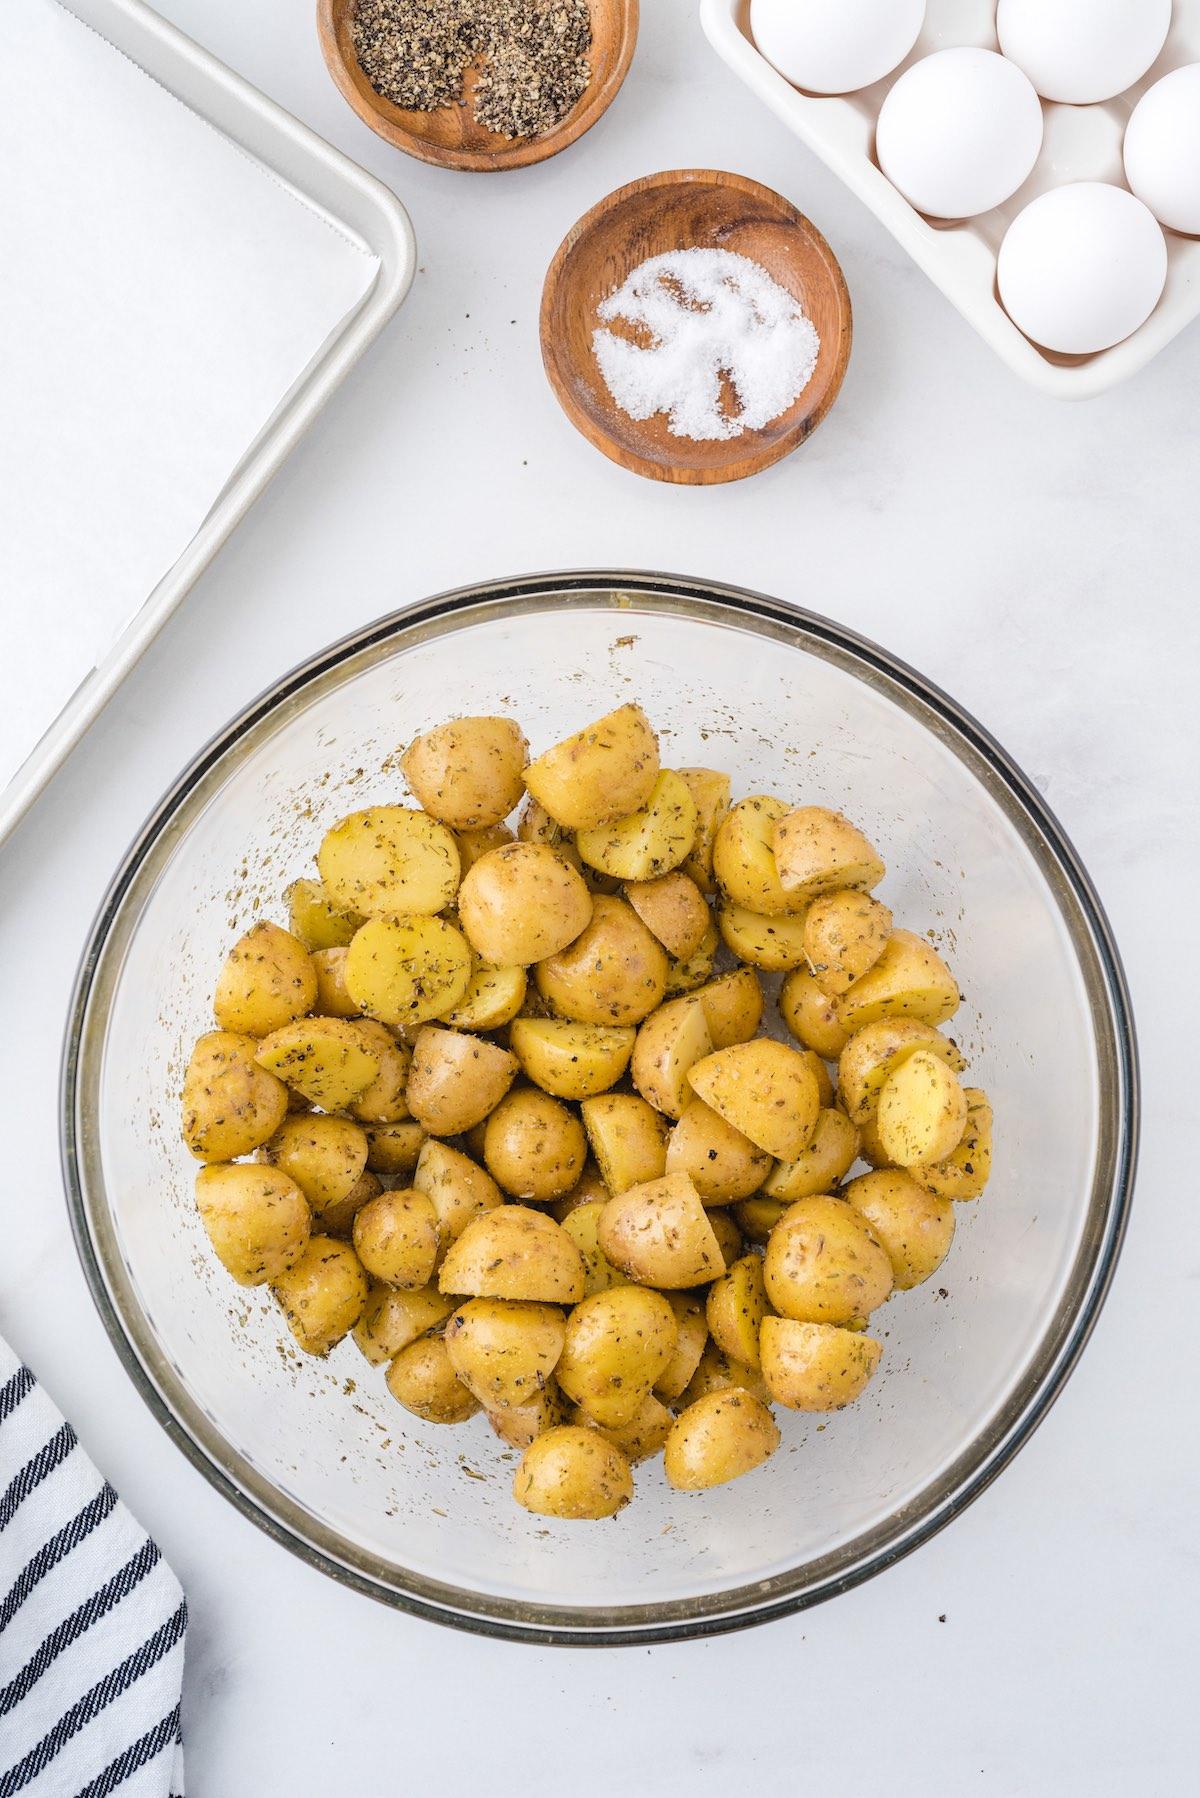 potatoes with seasoning in bowl